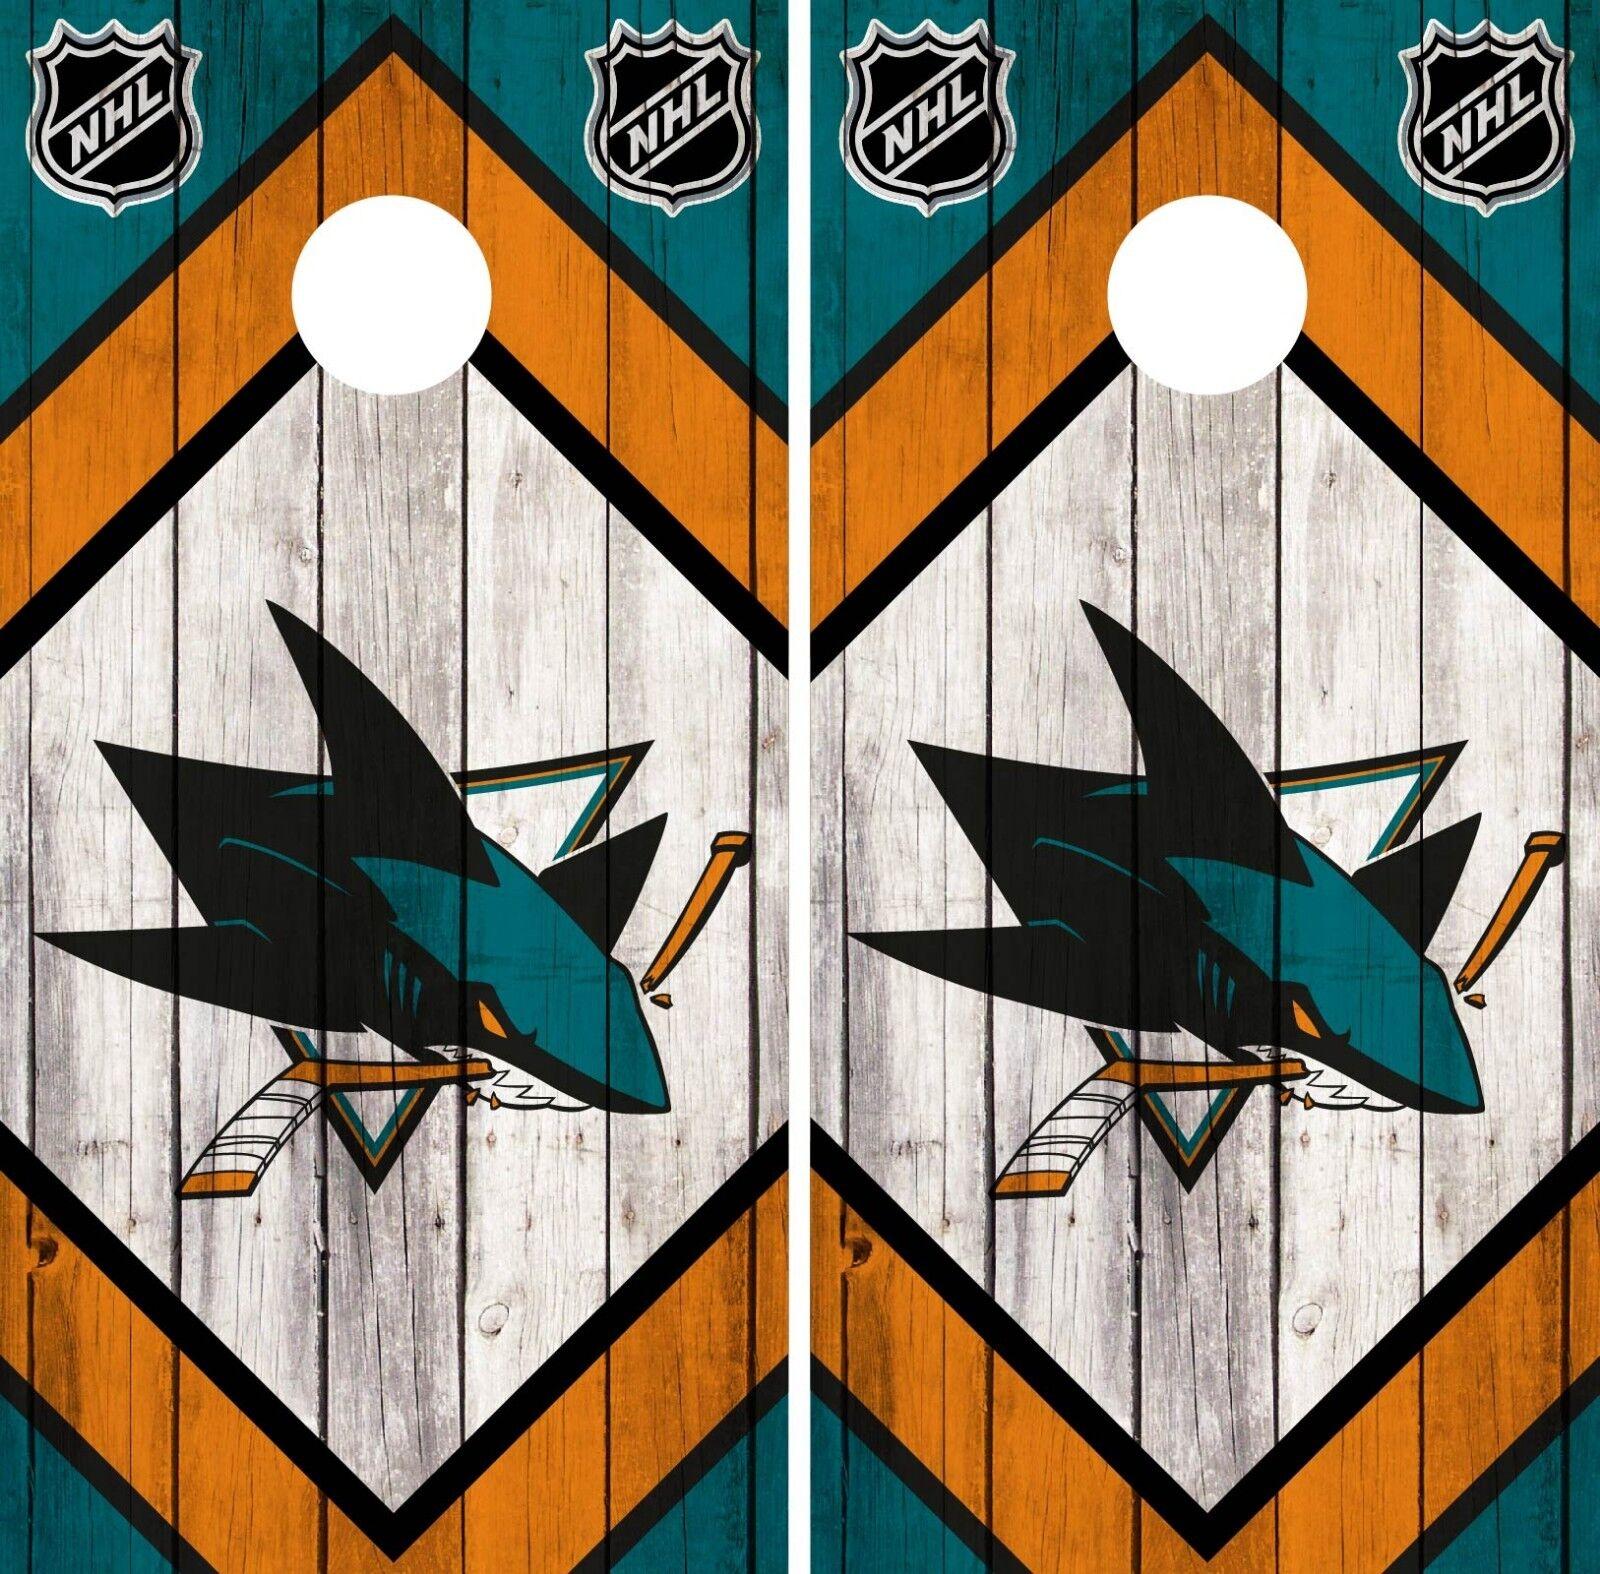 San Jose Sharks Cornhole Wrap NHL  Team Flag Game Skin Set Vinyl Decal CO208  best service